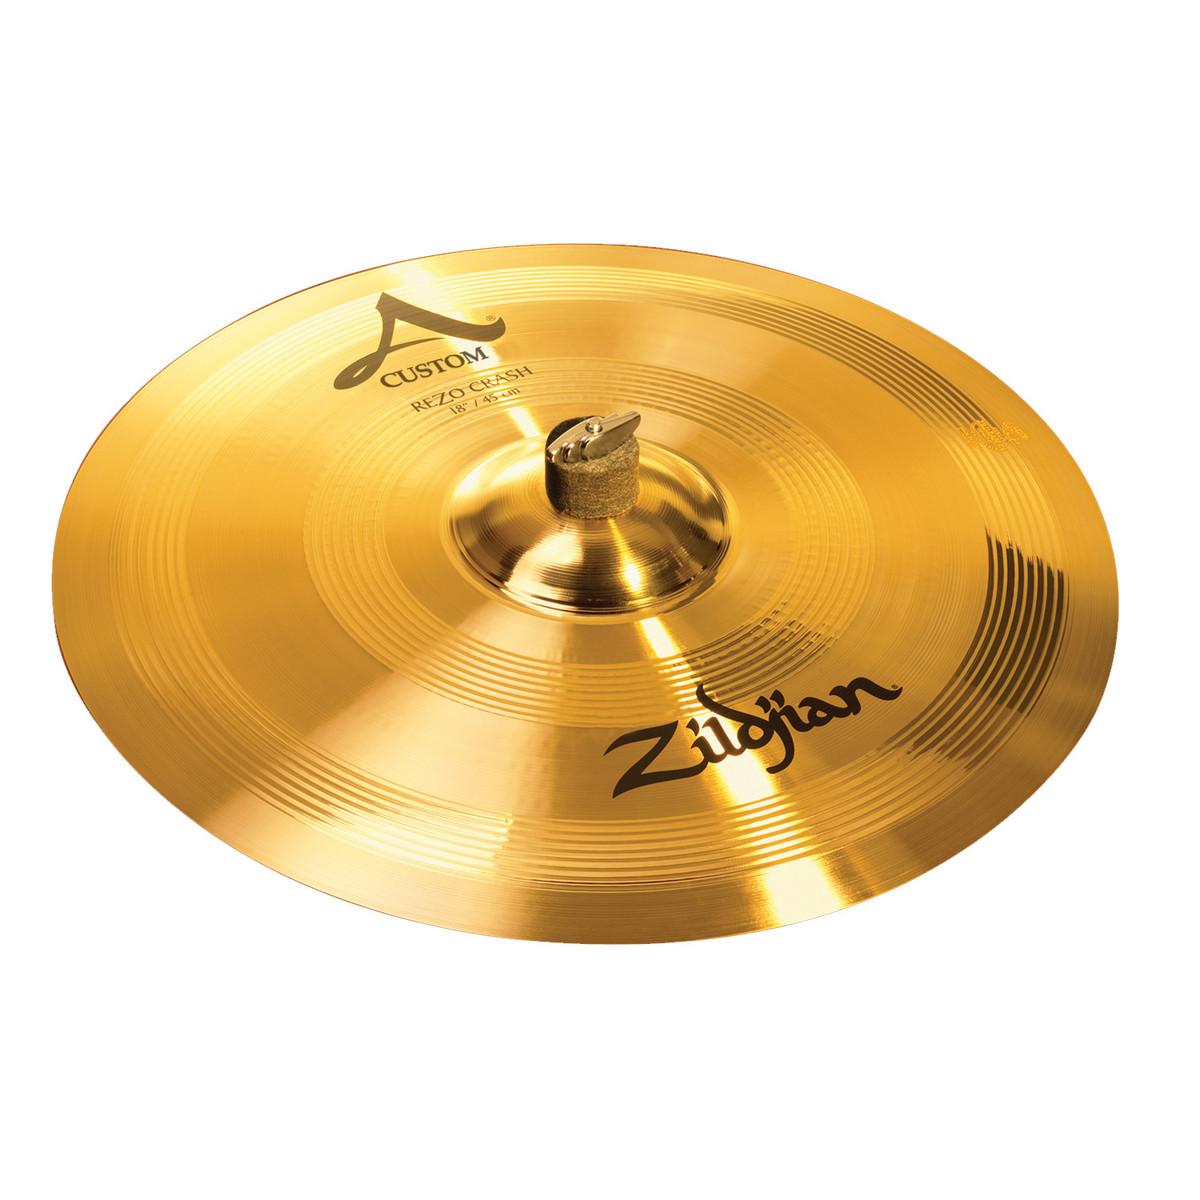 disc zildjian a custom 18 39 39 rezo crash cymbal at gear4music. Black Bedroom Furniture Sets. Home Design Ideas